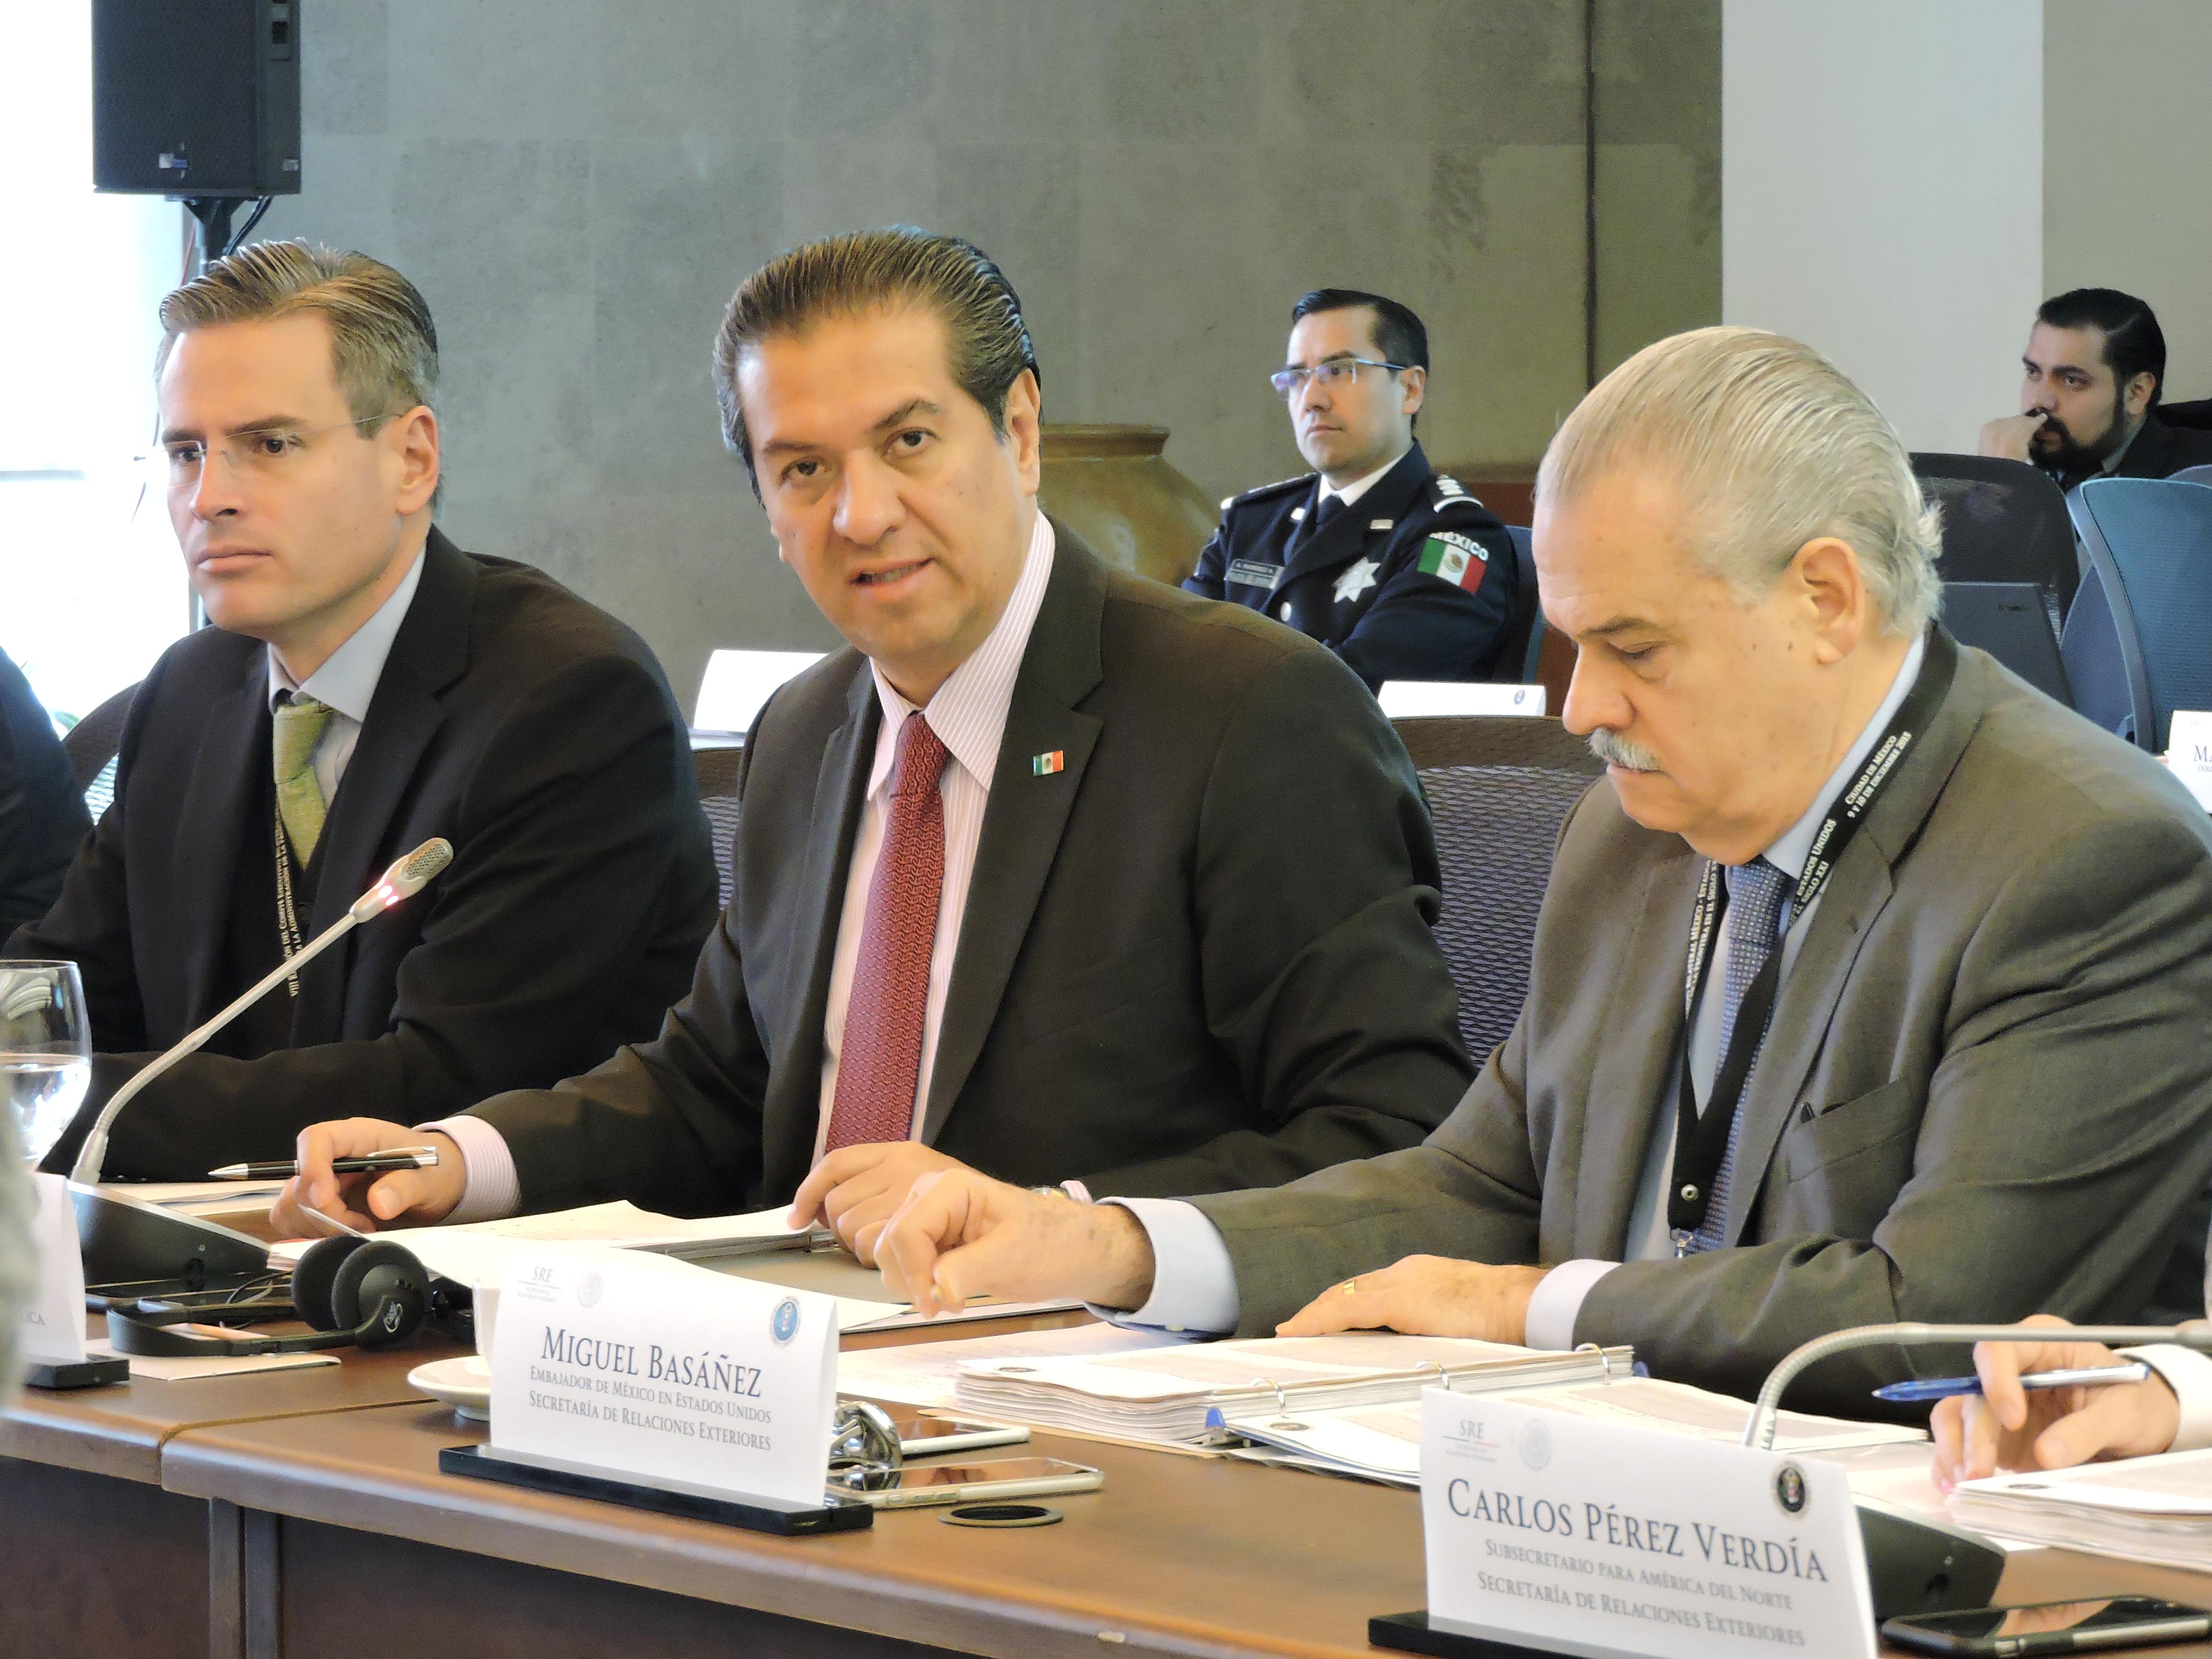 Deputy Attorney General for Legal and International Affairs of the Attorney General's Office, José Alberto Rodríguez Calderón, Undersecretary Carlos Pérez Verdía (SRE) and Ambassador Miguel Basáñez